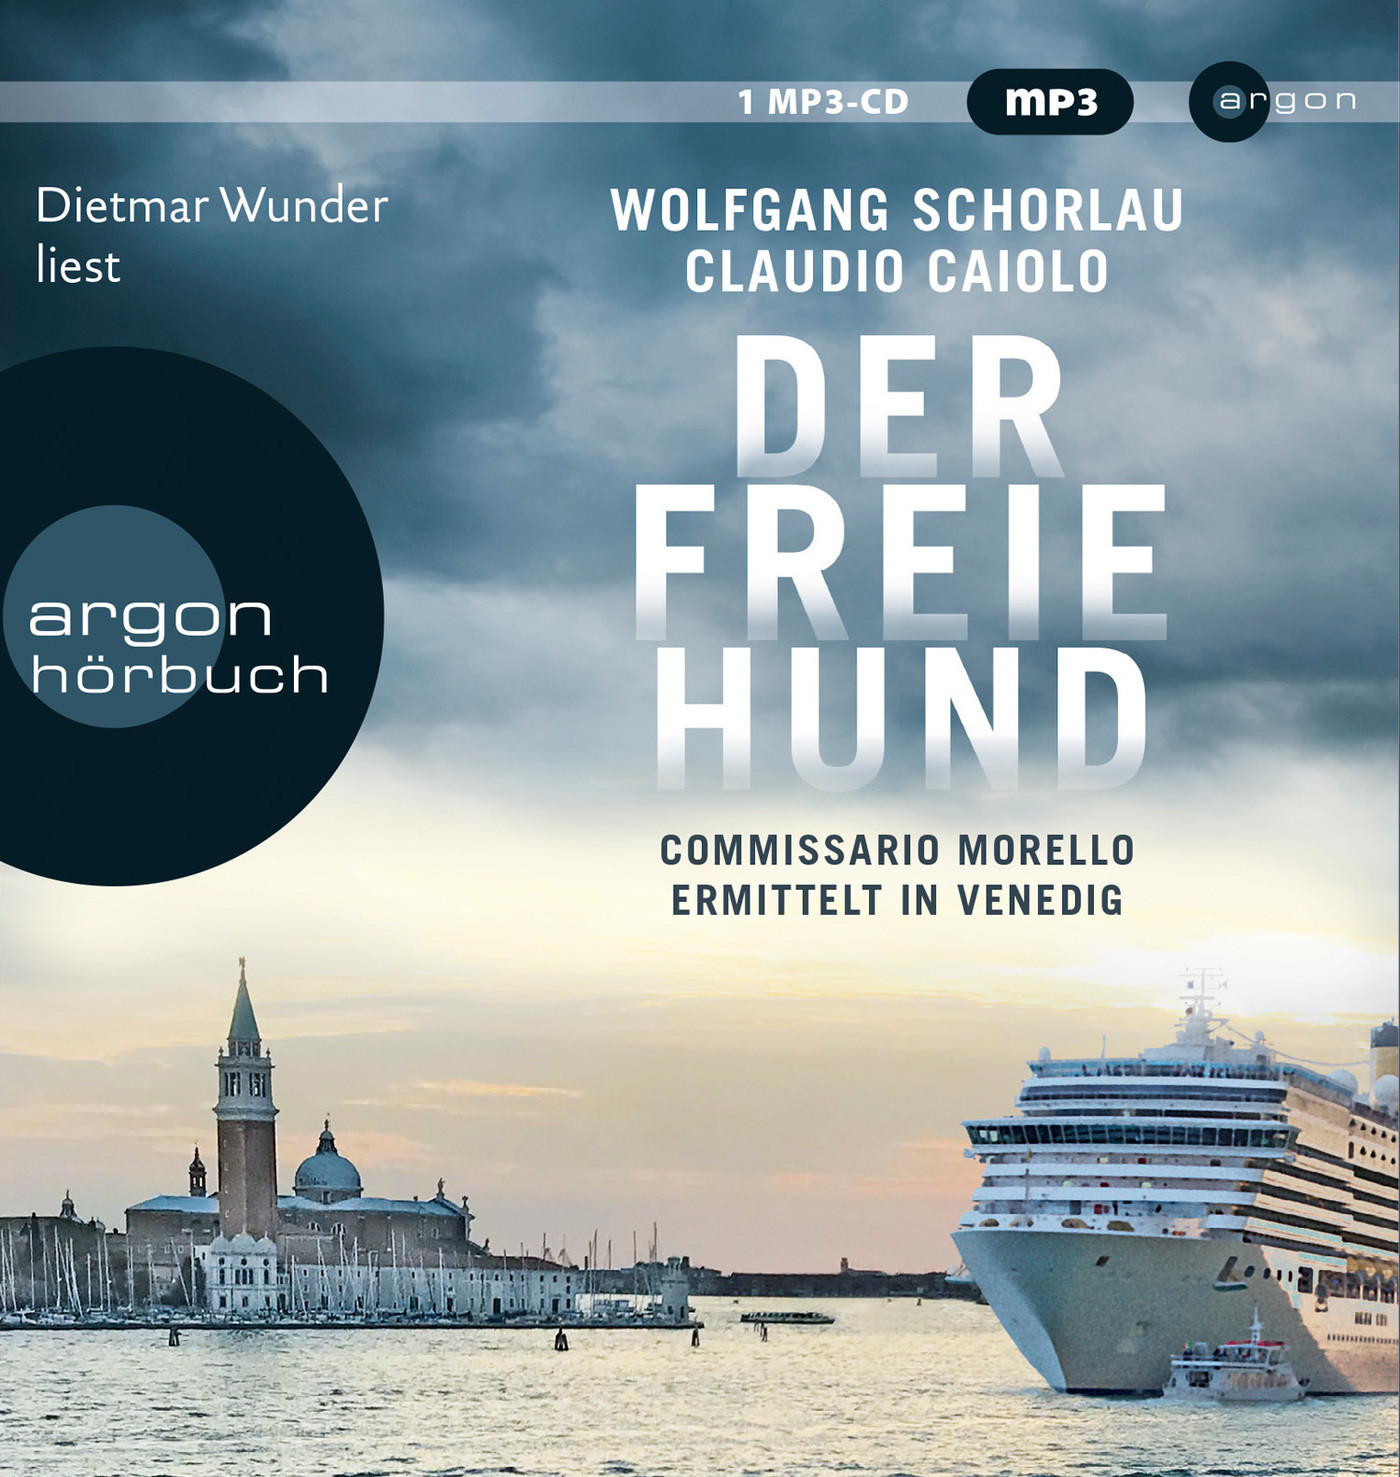 Wolfgang Schorlau, Claudio Caiolo - Der freie Hund: Commissario Morello ermittelt in Venedig